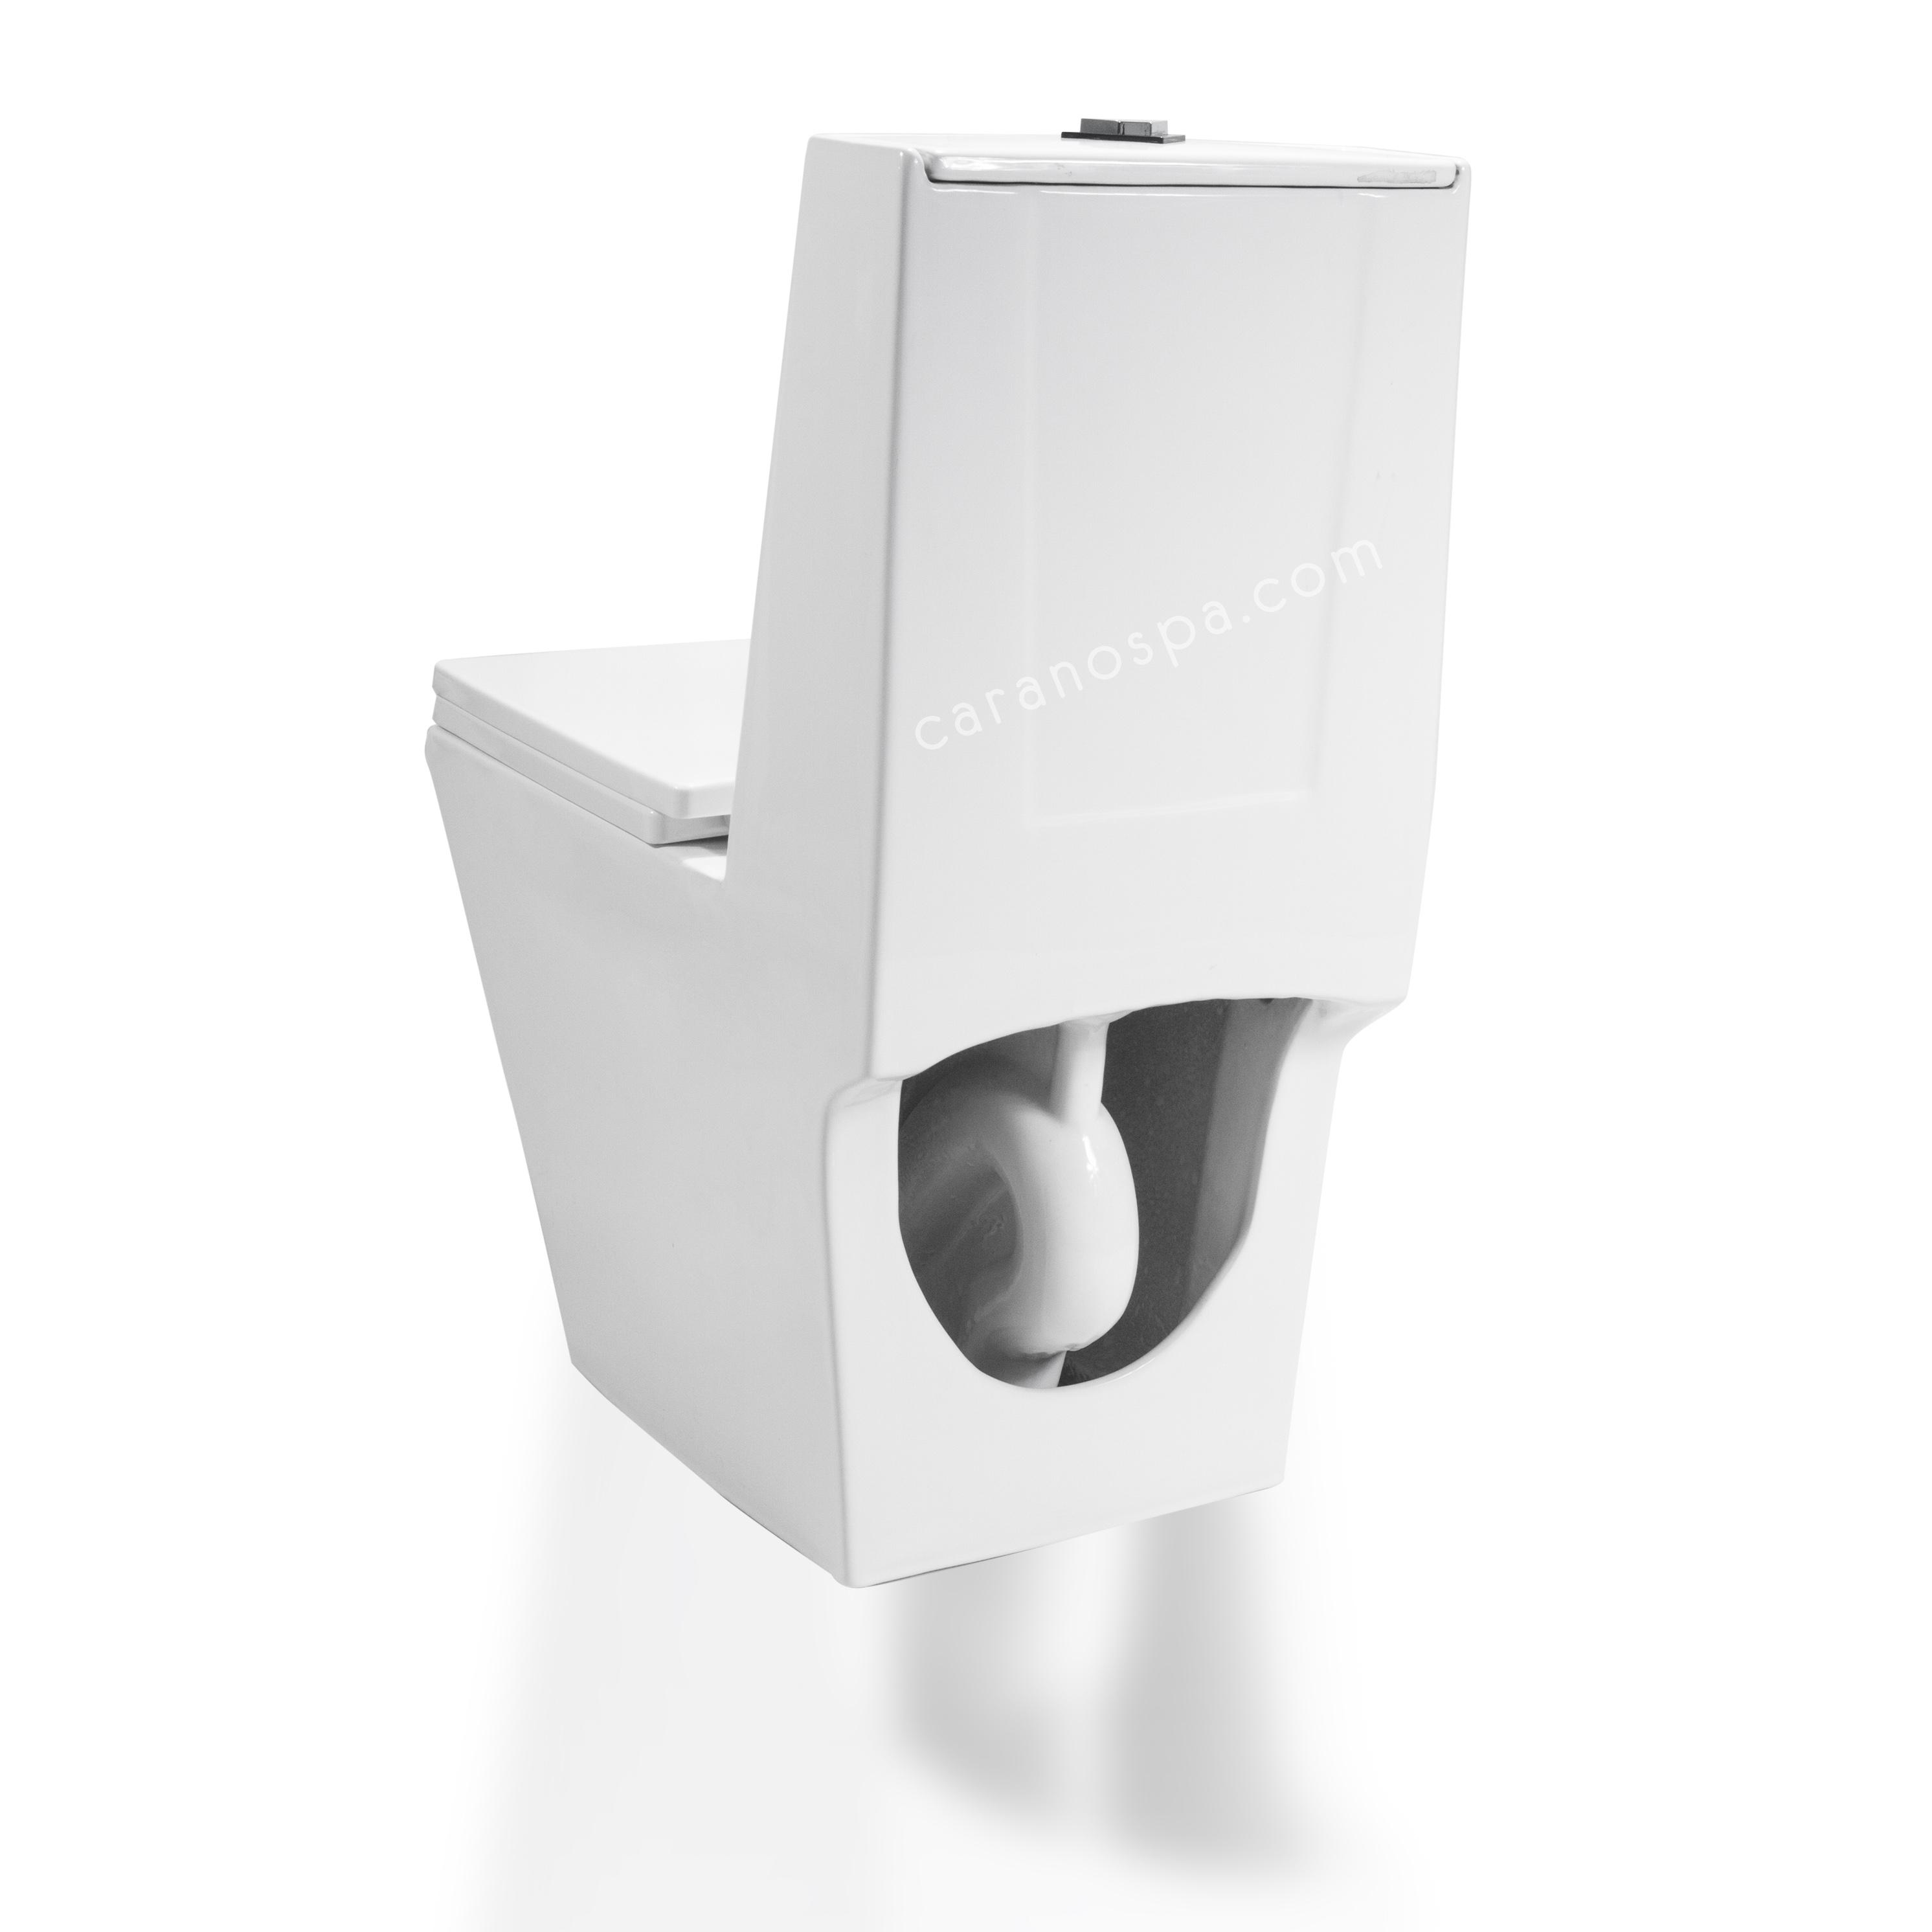 BỒN CẦU CARANO 1 KHỐI K70 (Toilet model: K70 )